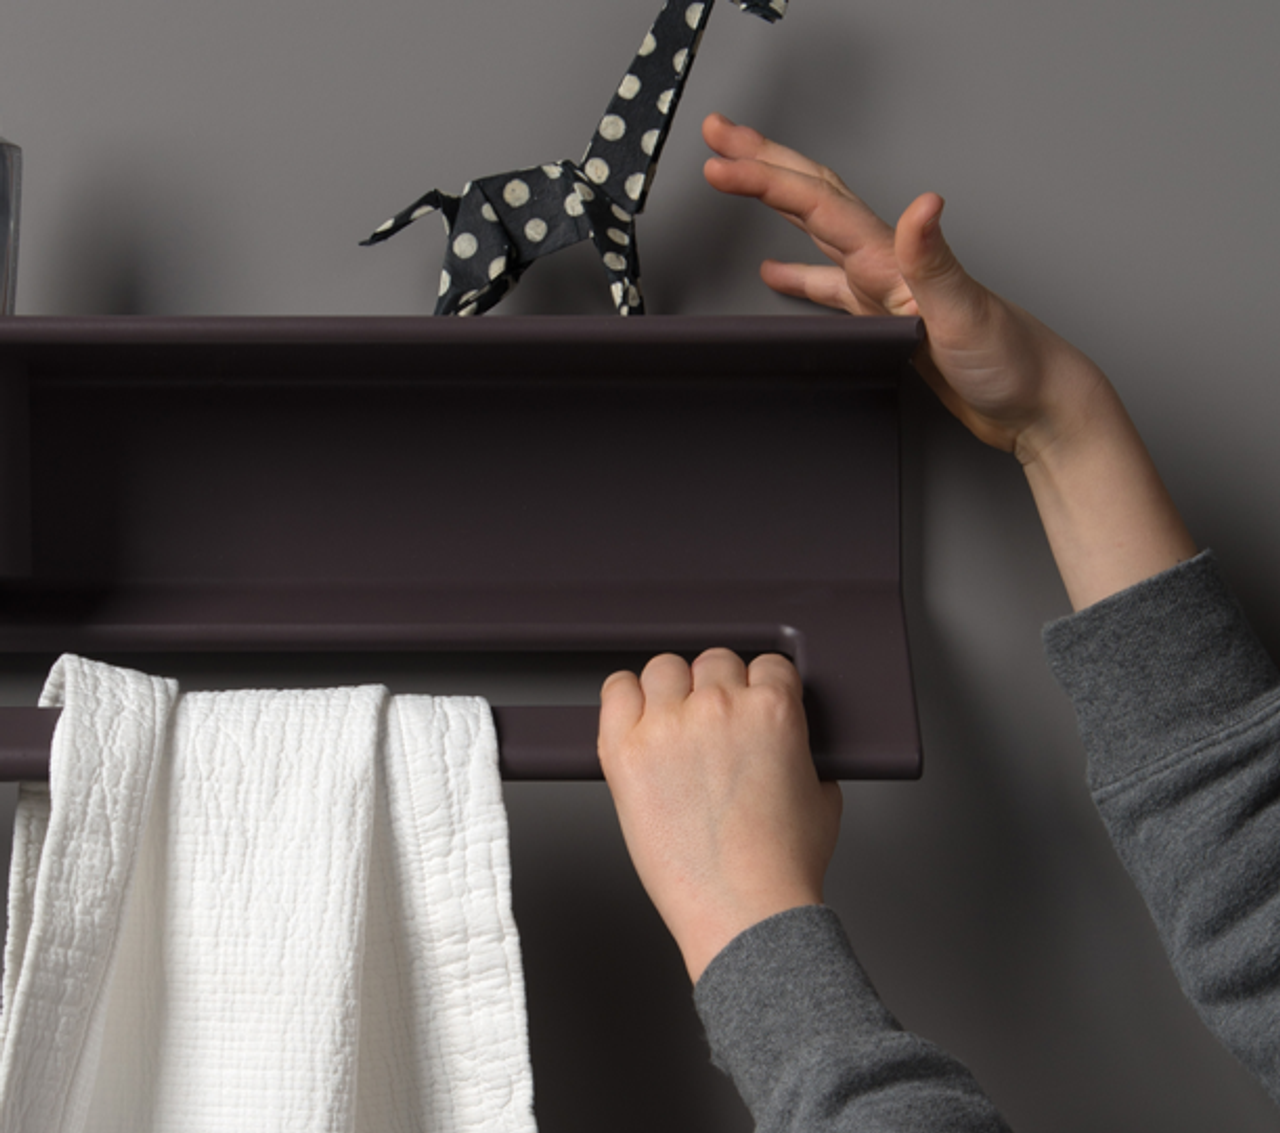 Duality™ Gray Purple Hybrid™ Floating Shelf With Towel Holder & Grab Bar